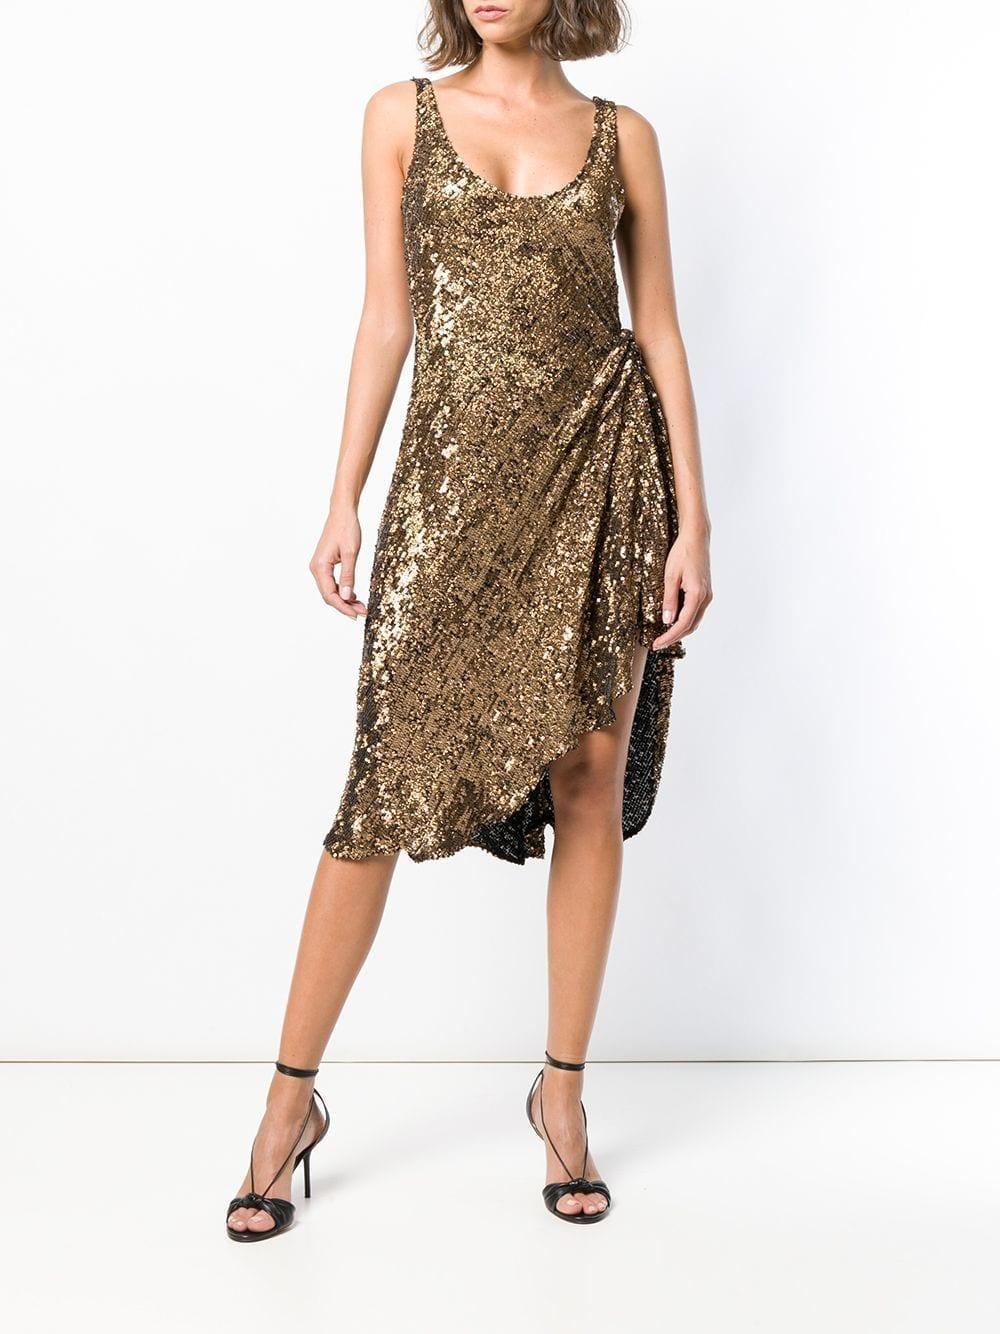 30315705030d MARIA LUCIA HOHAN Dominika Bronze Dress - We Select Dresses